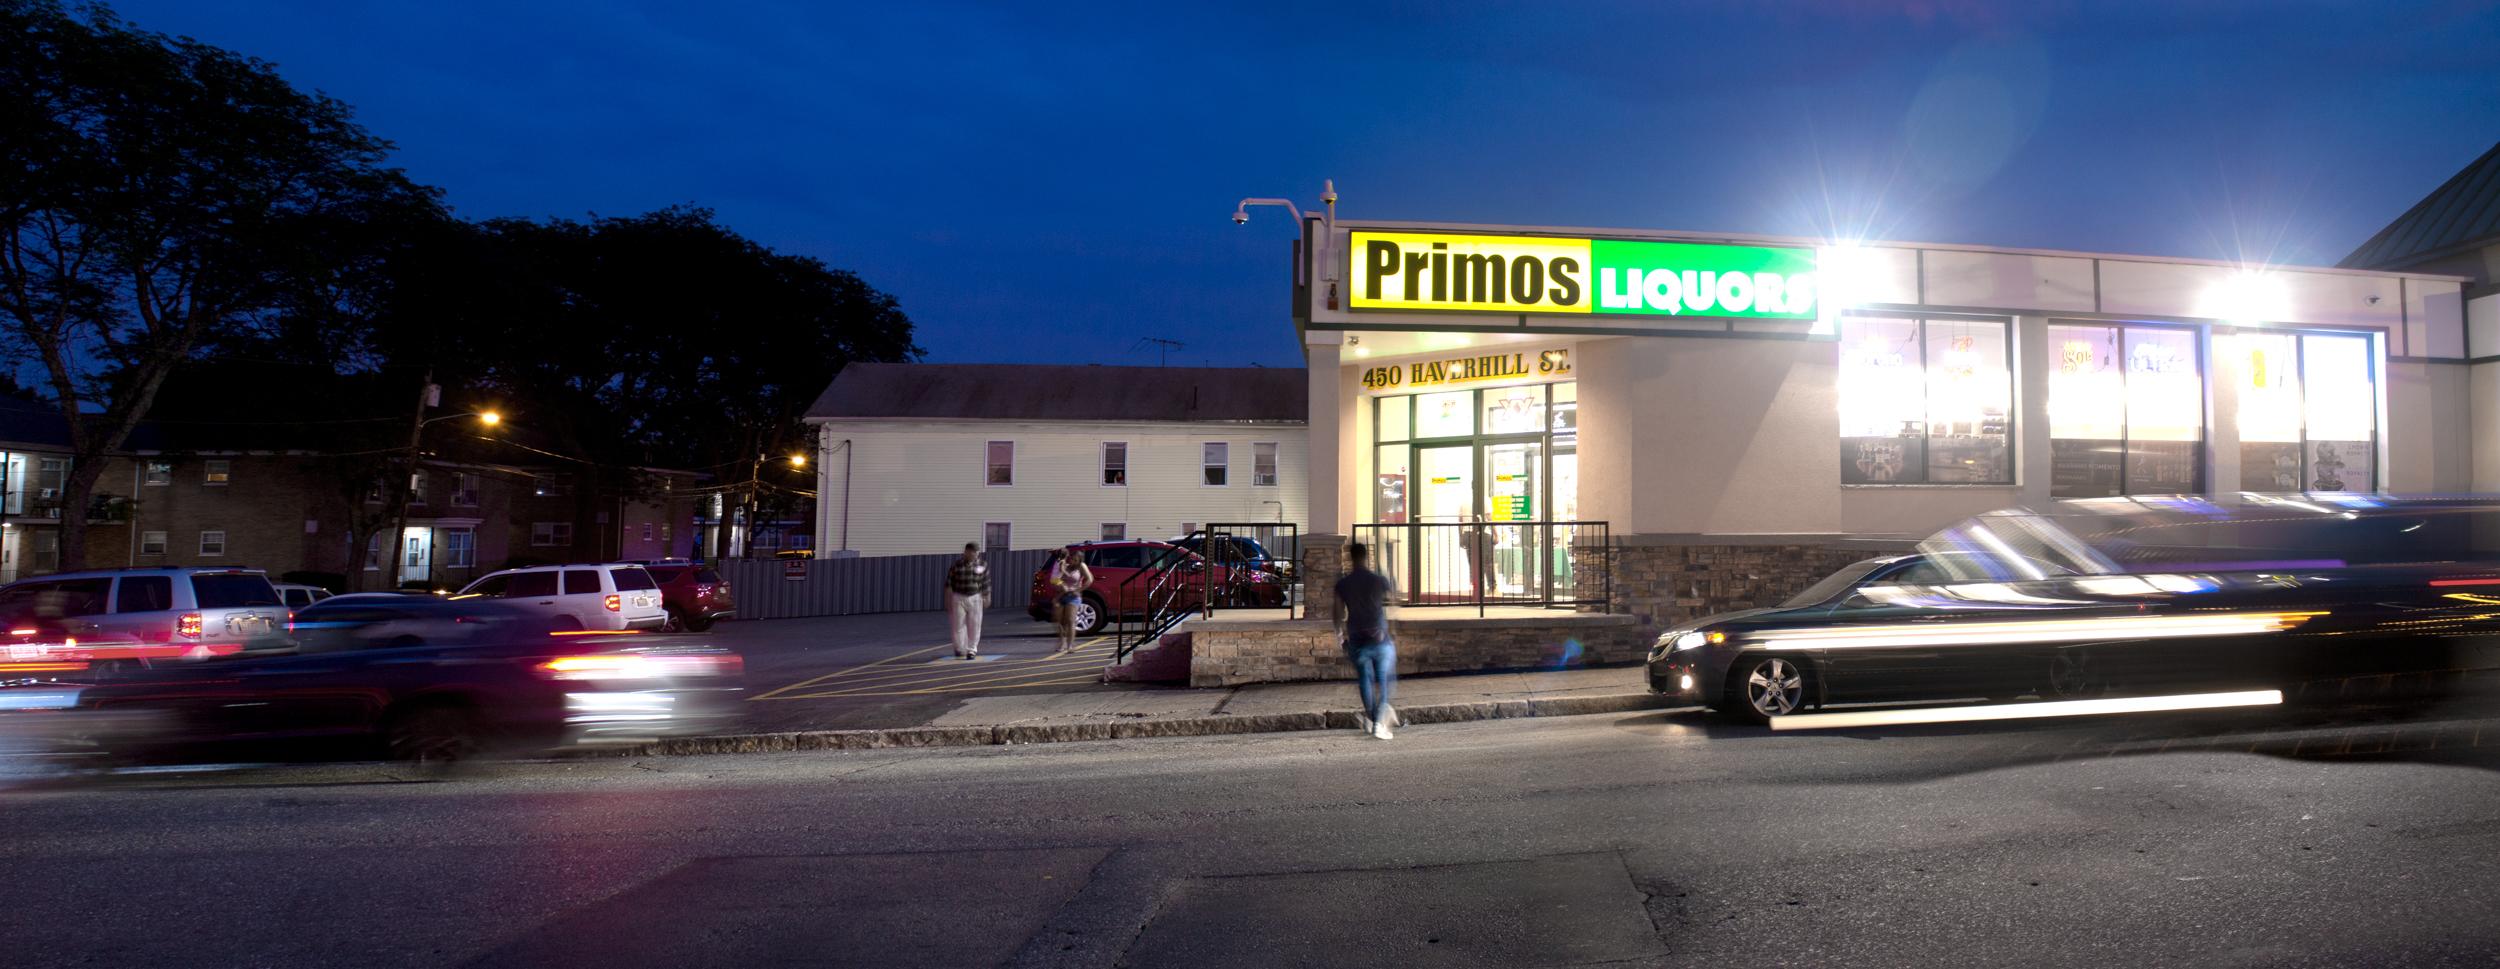 primos-liquor-p13.jpg